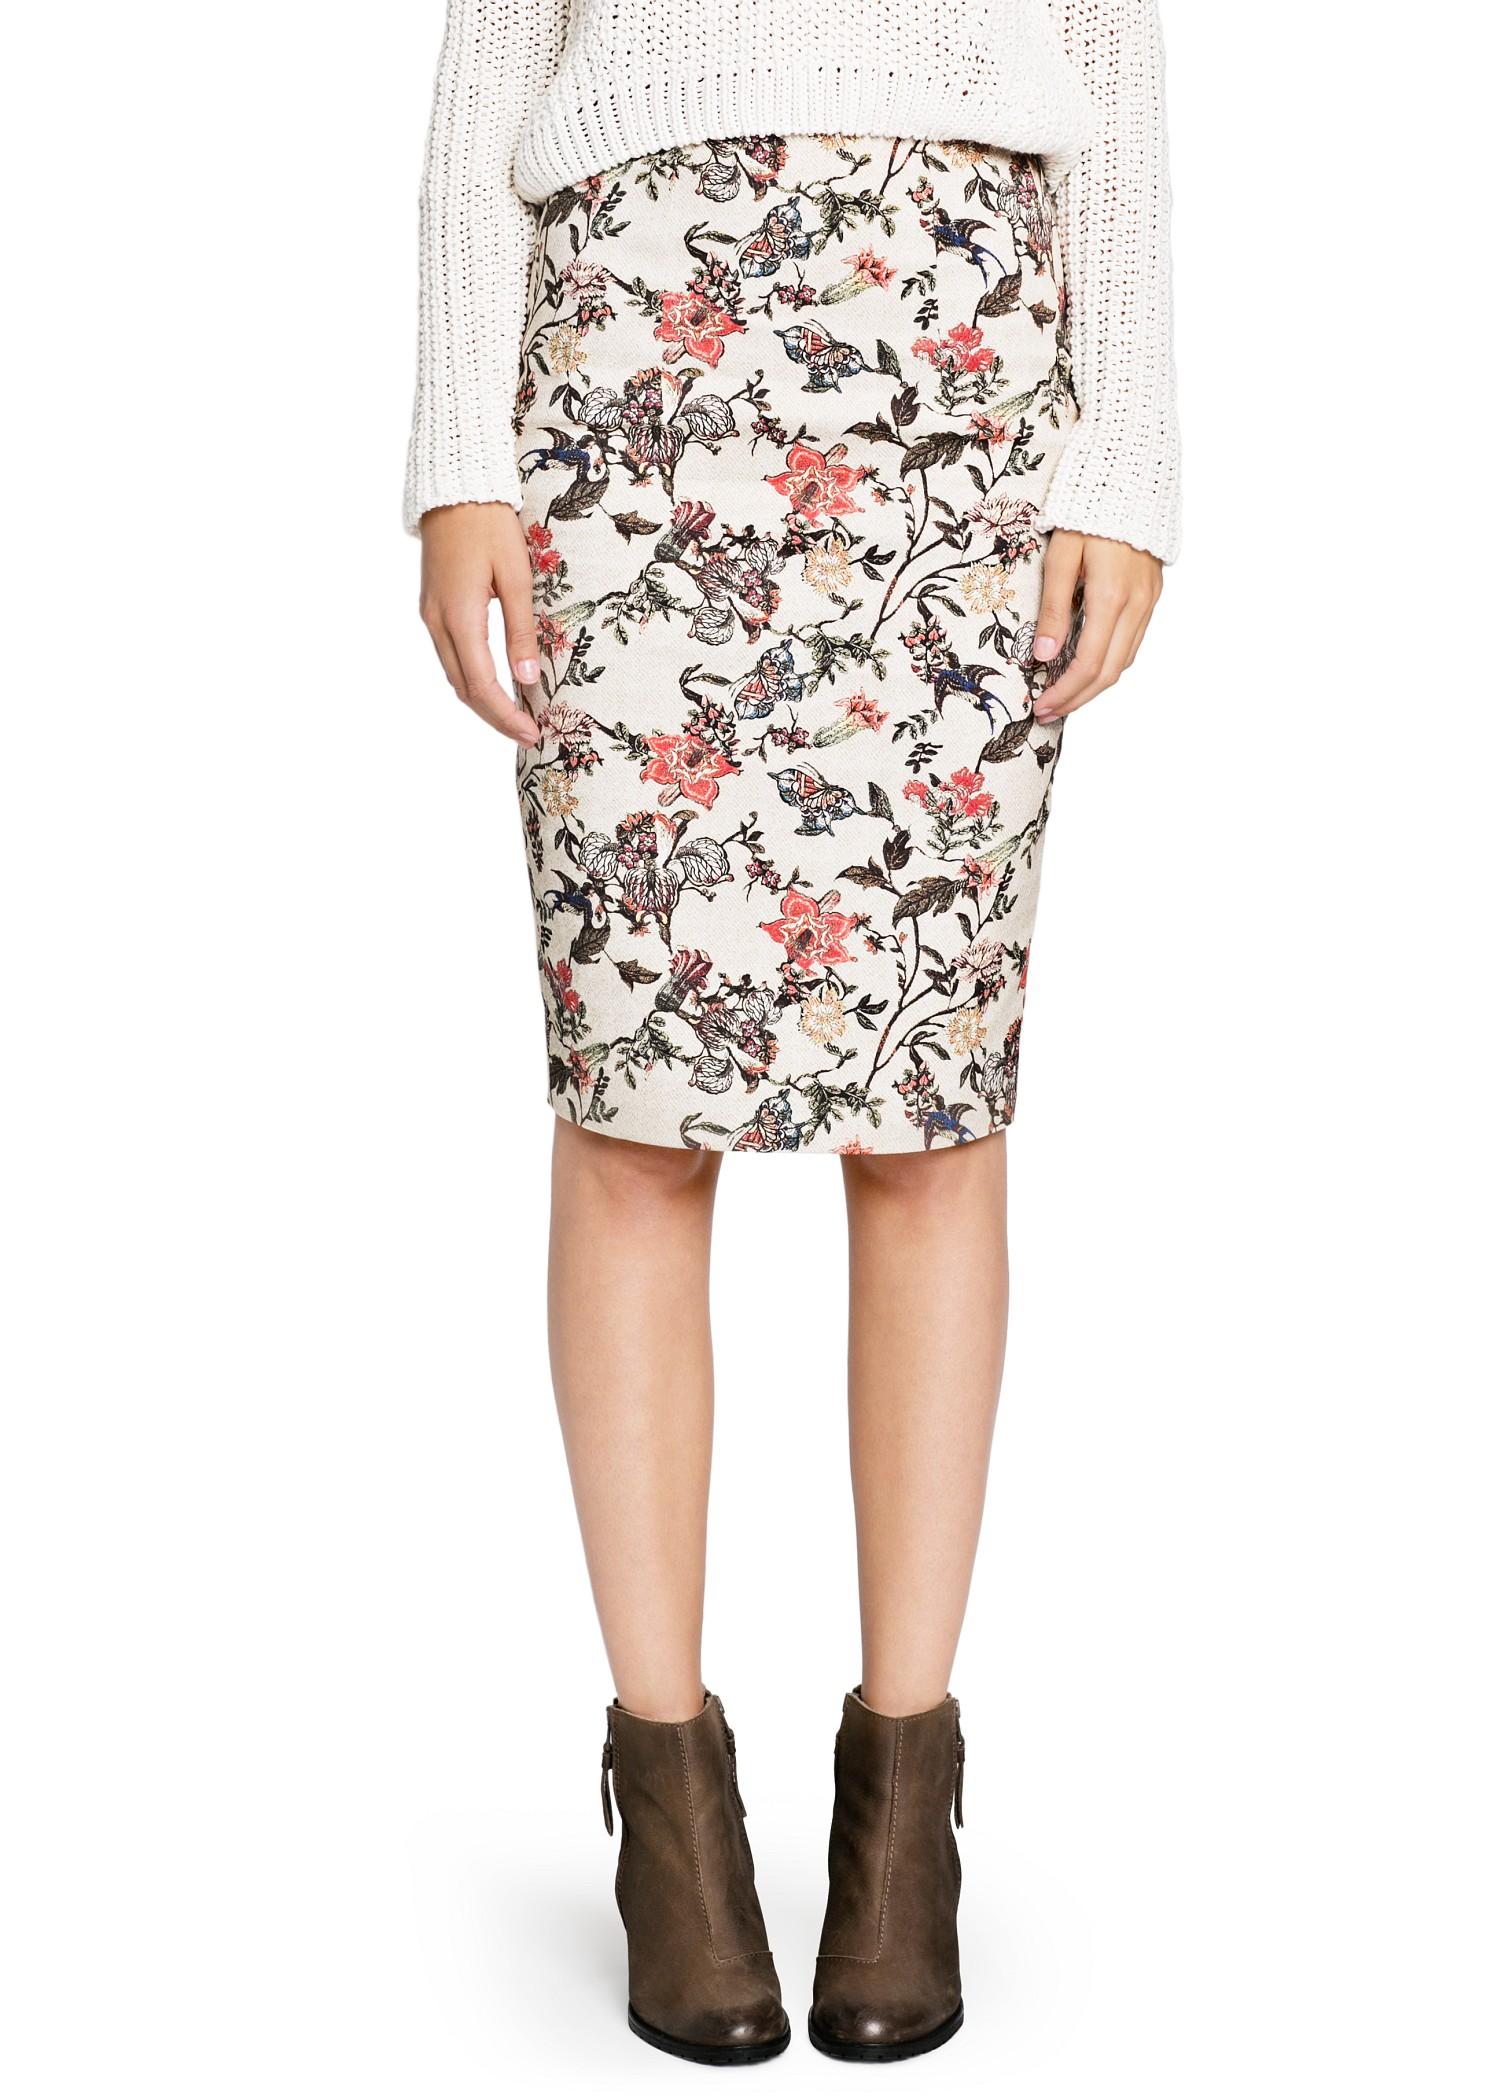 floral pencil skirt - photo #11